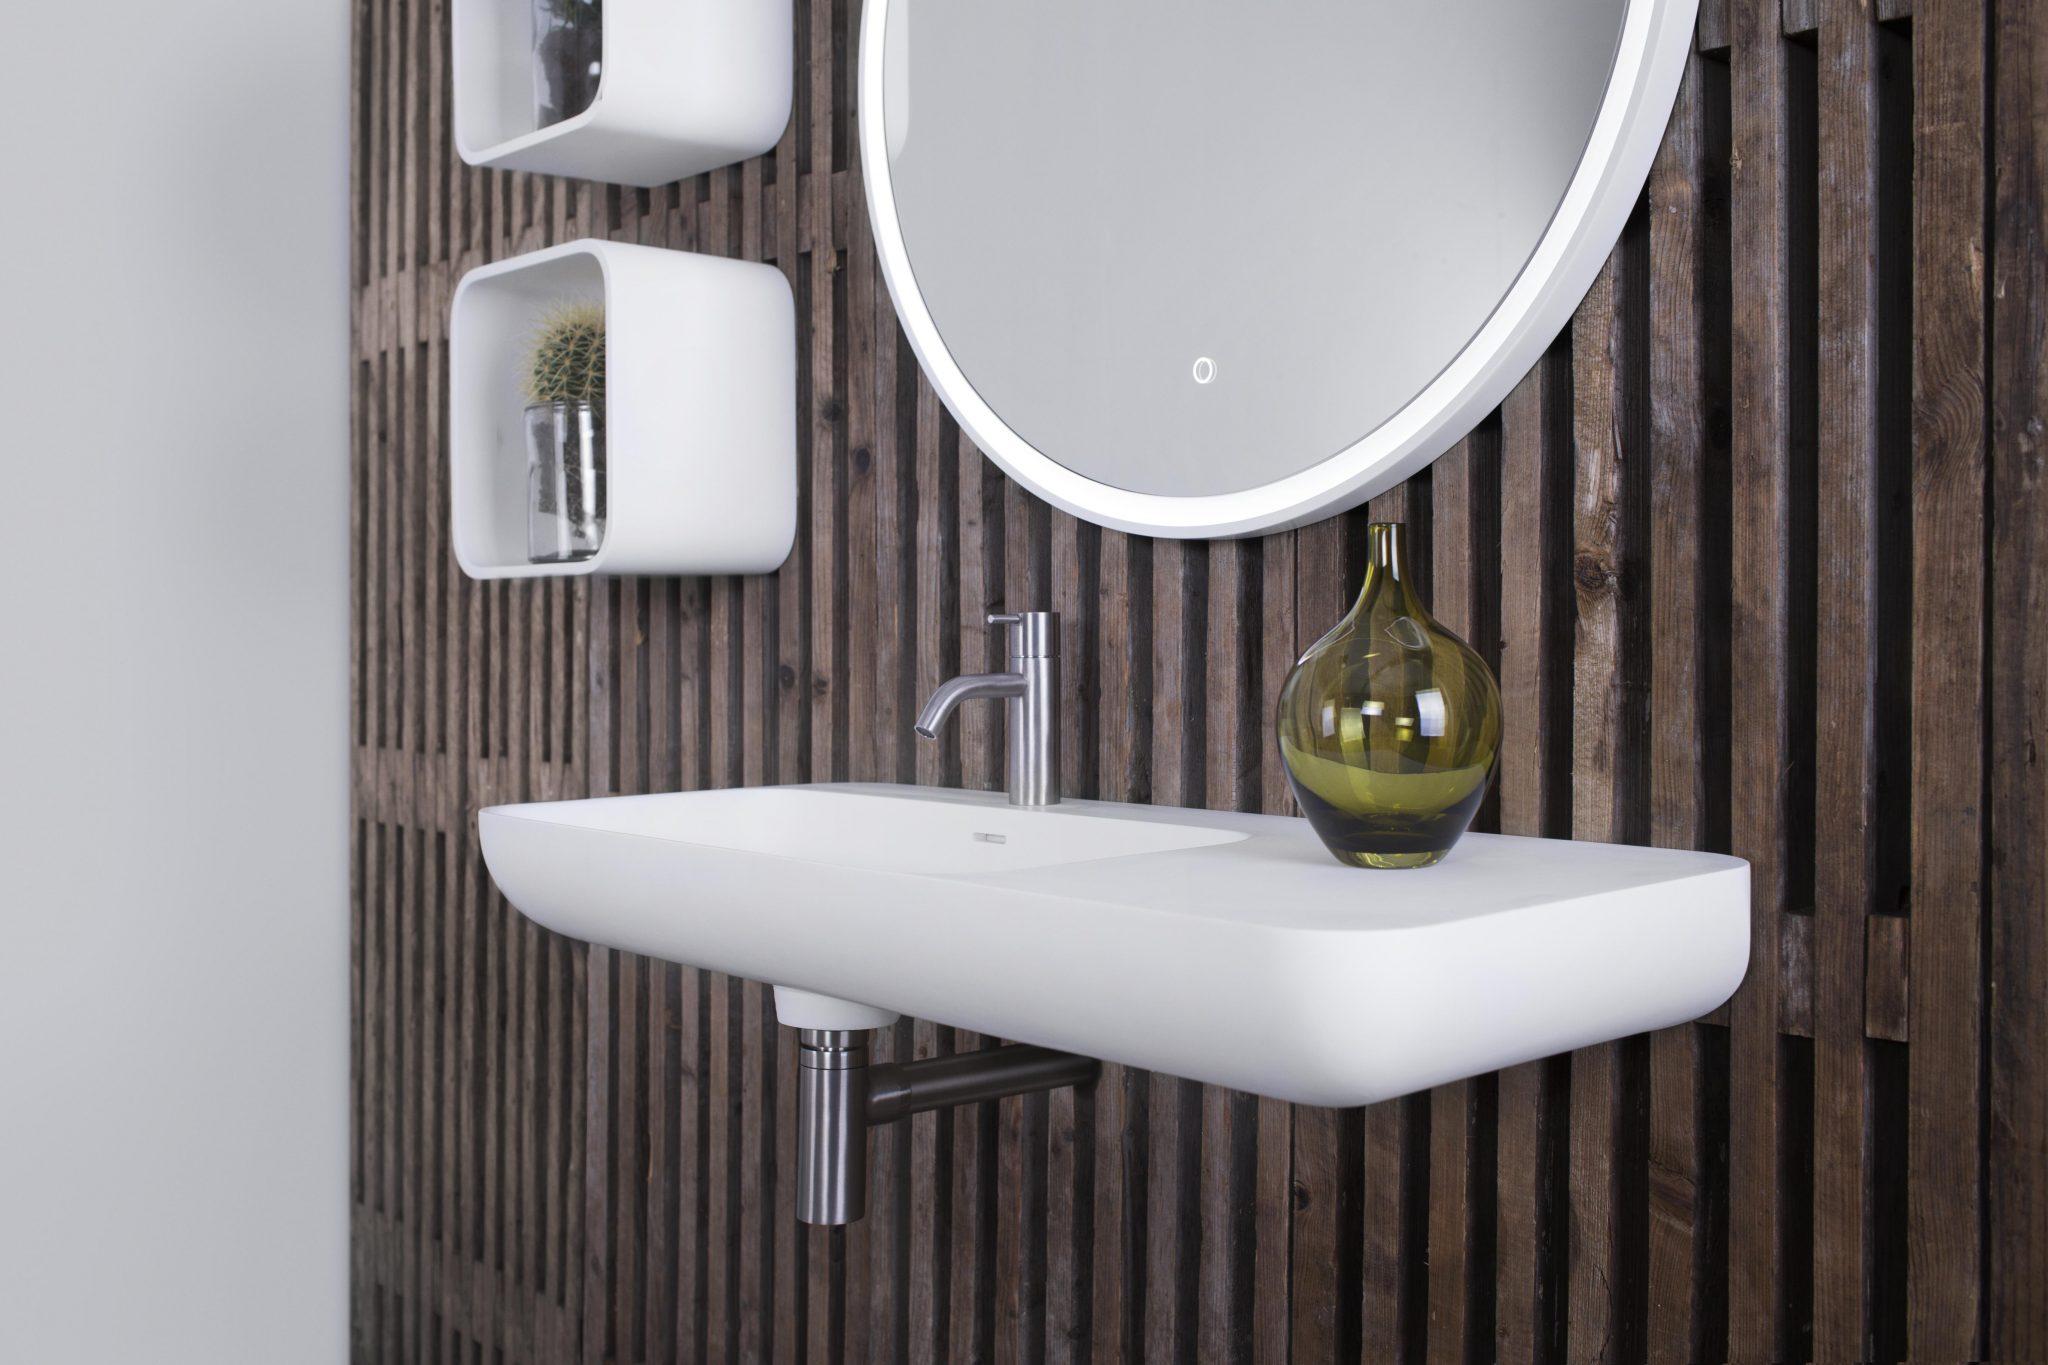 en-90-wash-basin-from-copenhagen-bath_26741464703_o